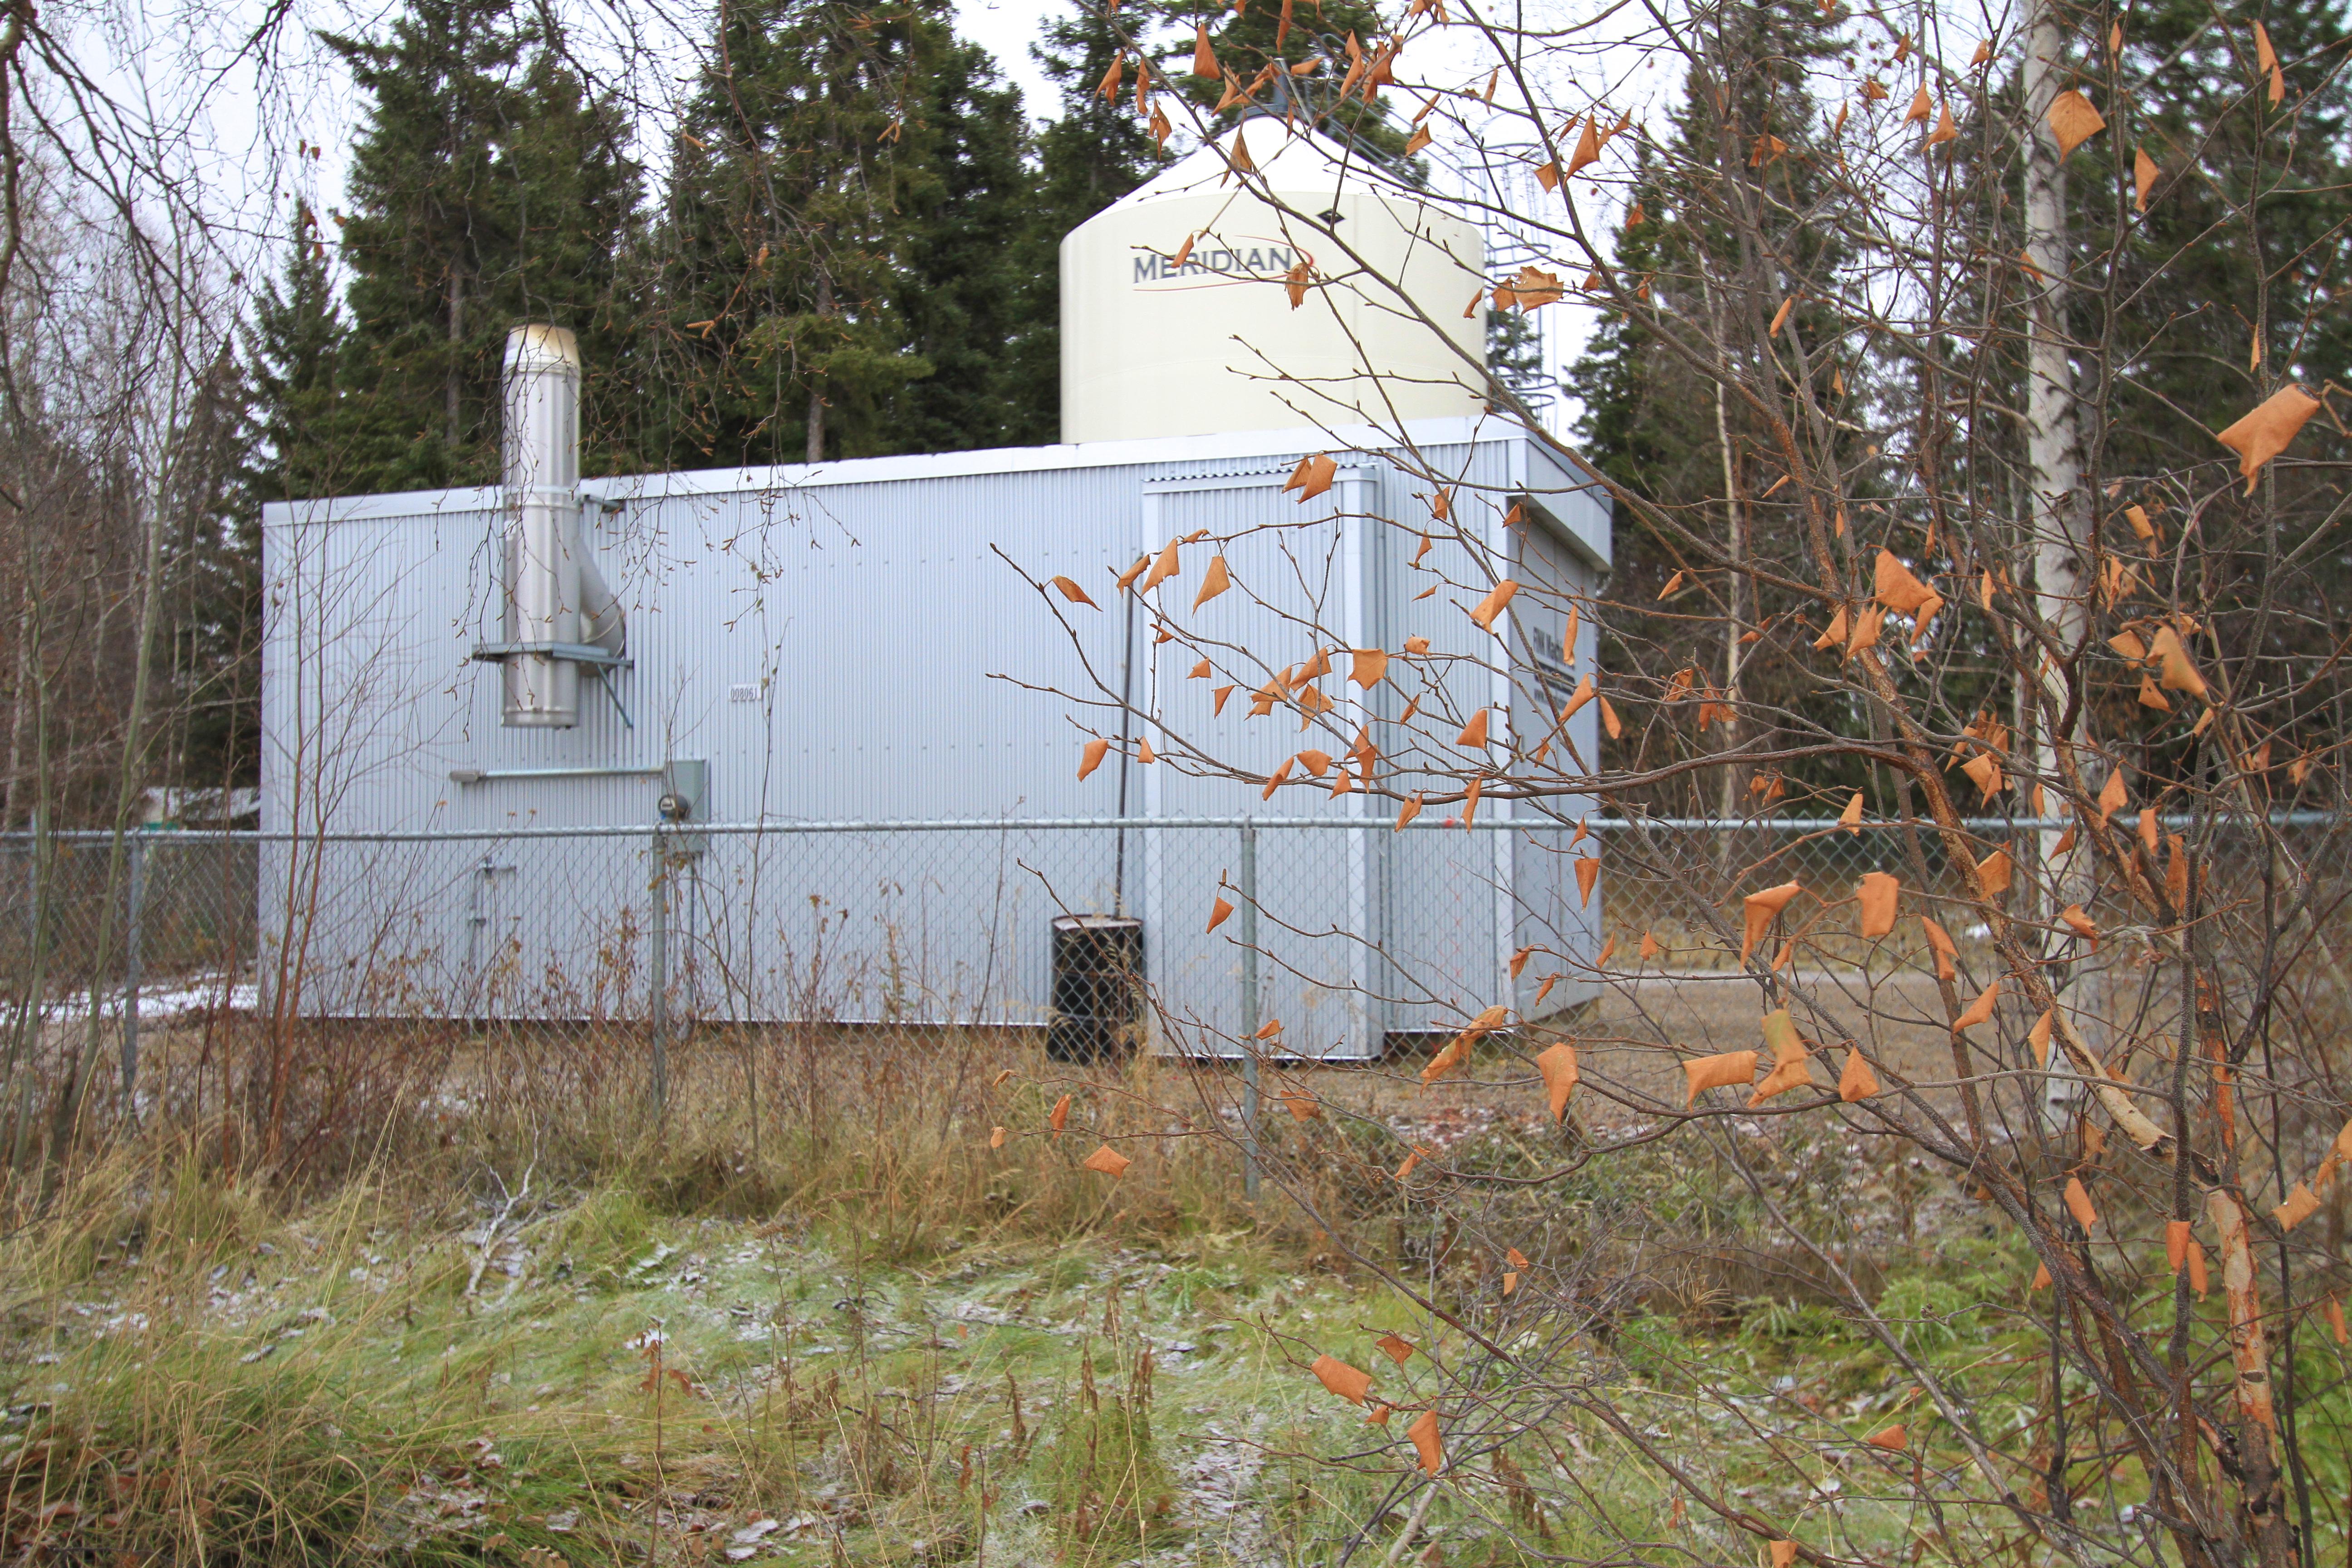 SMCC Biomass project